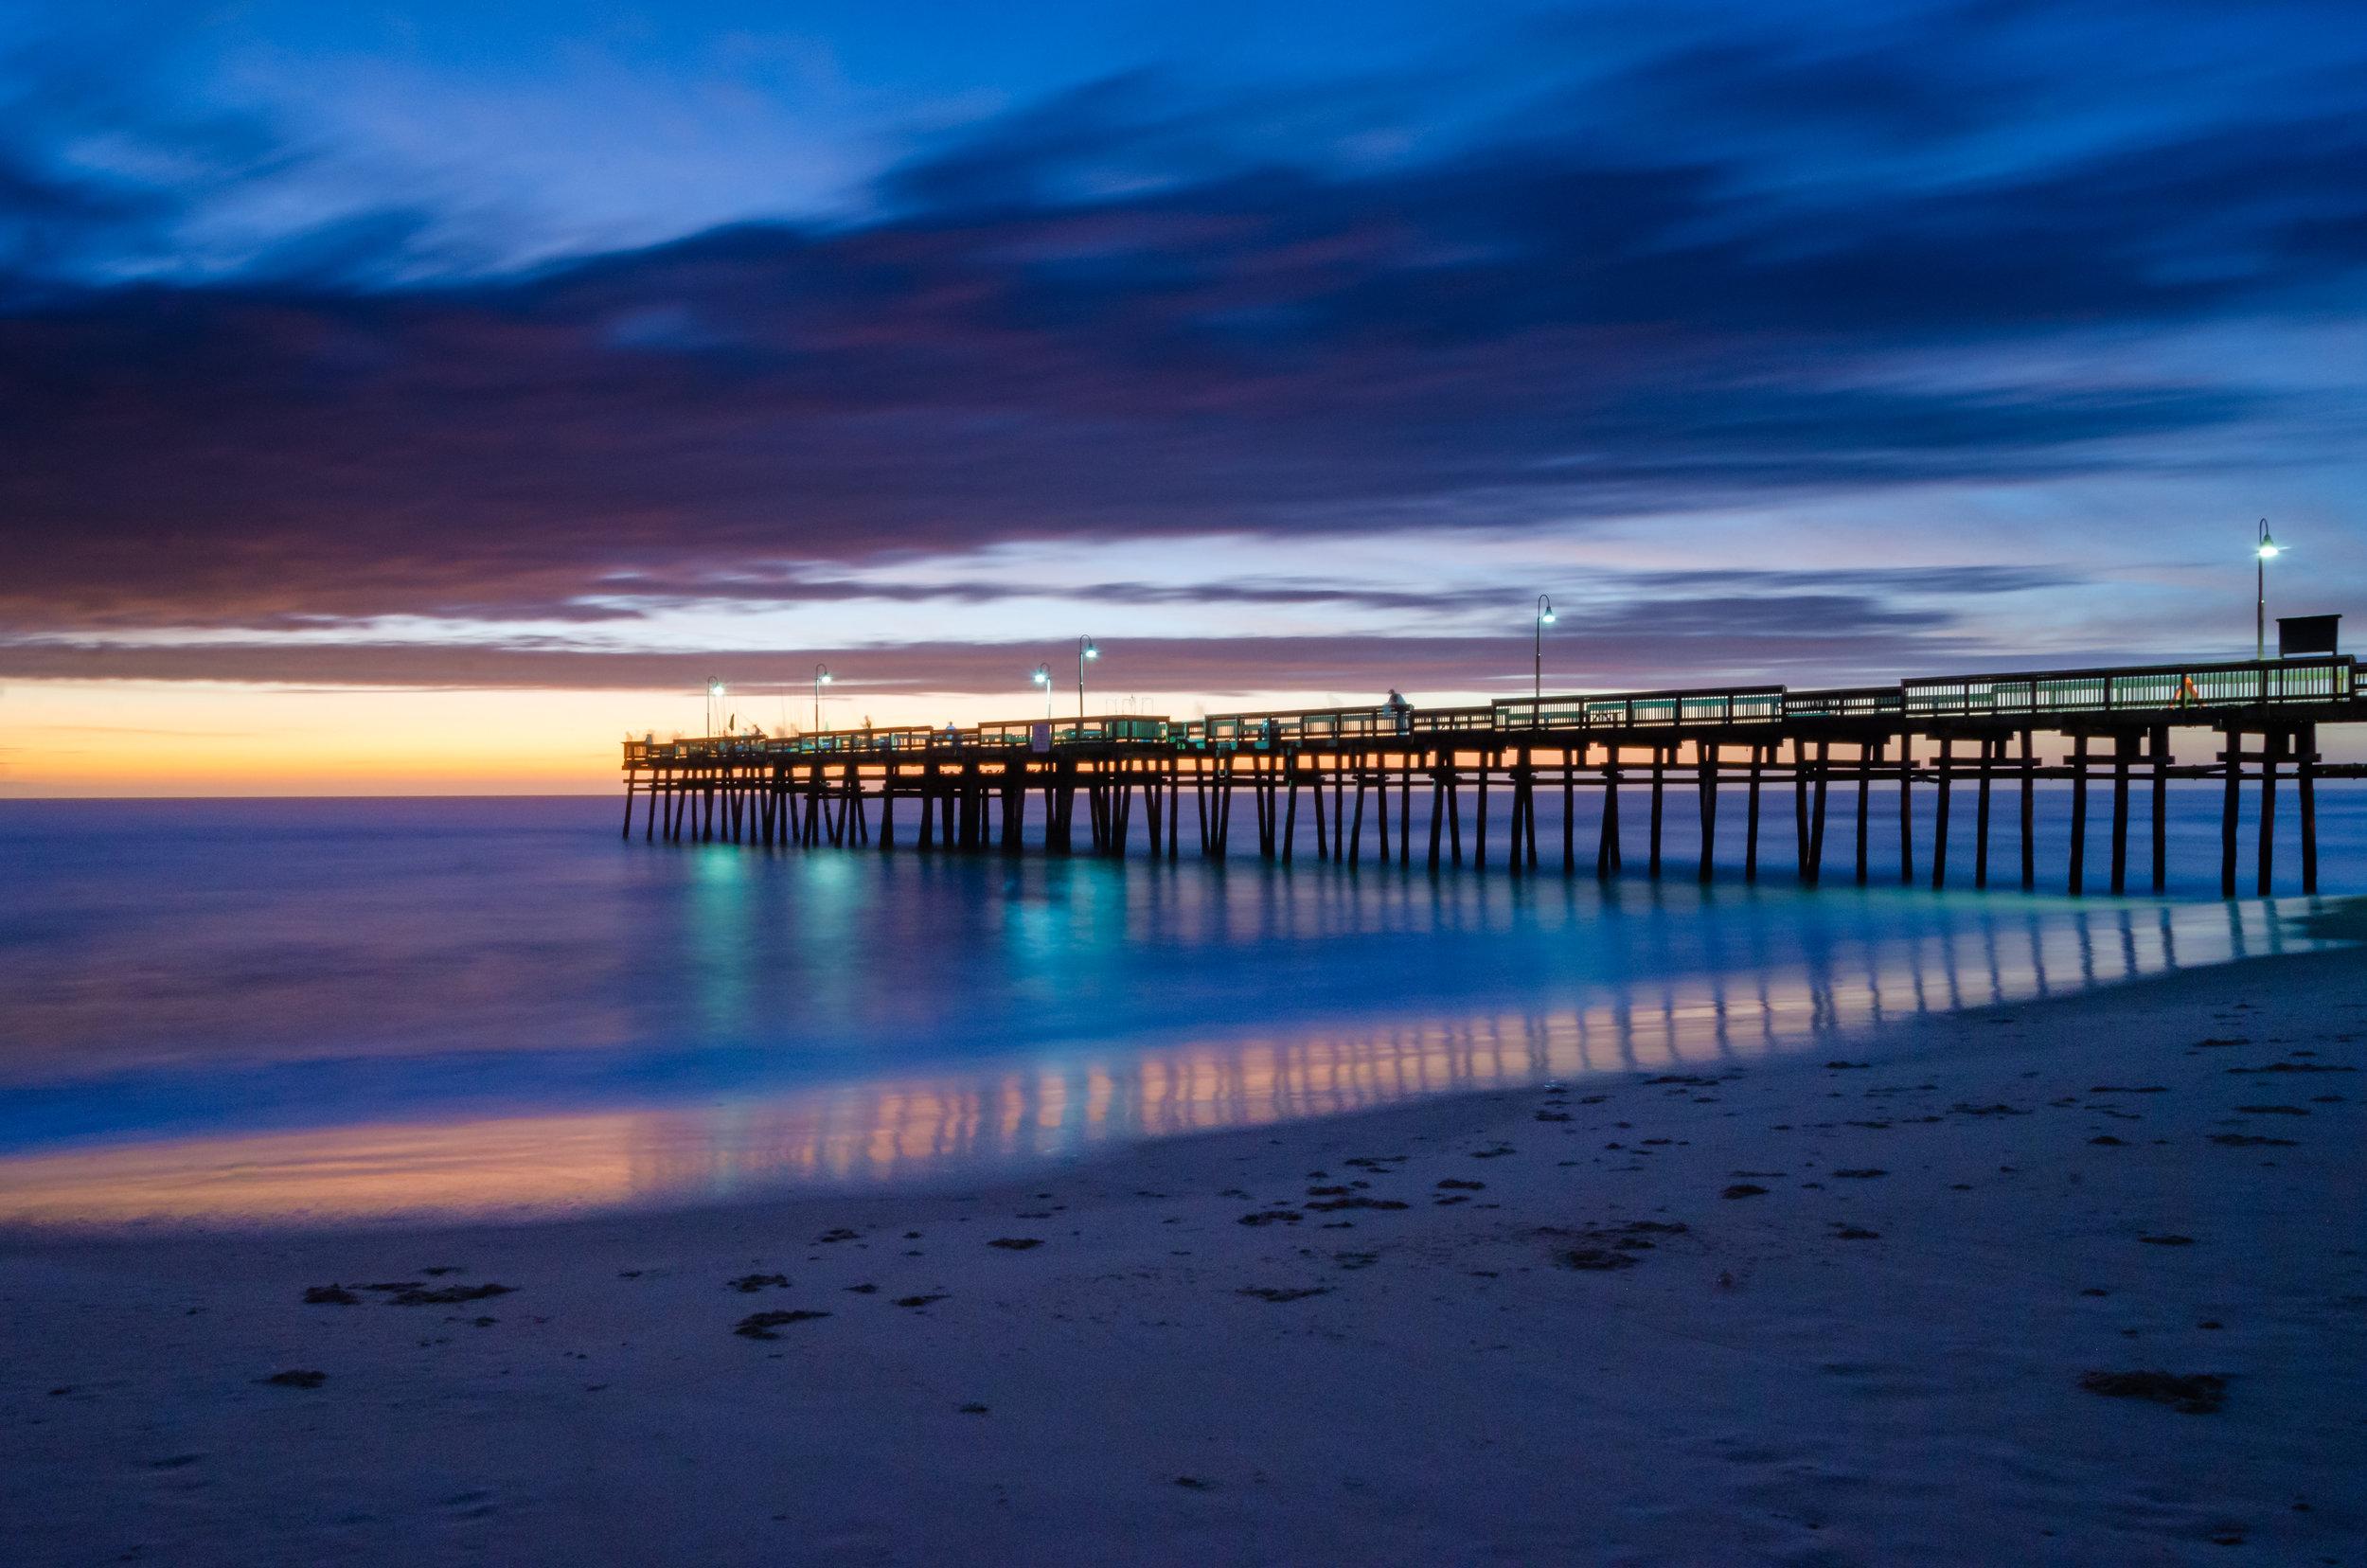 sandbridge pier-virginia beach-virginia-sunrise-purple.jpg